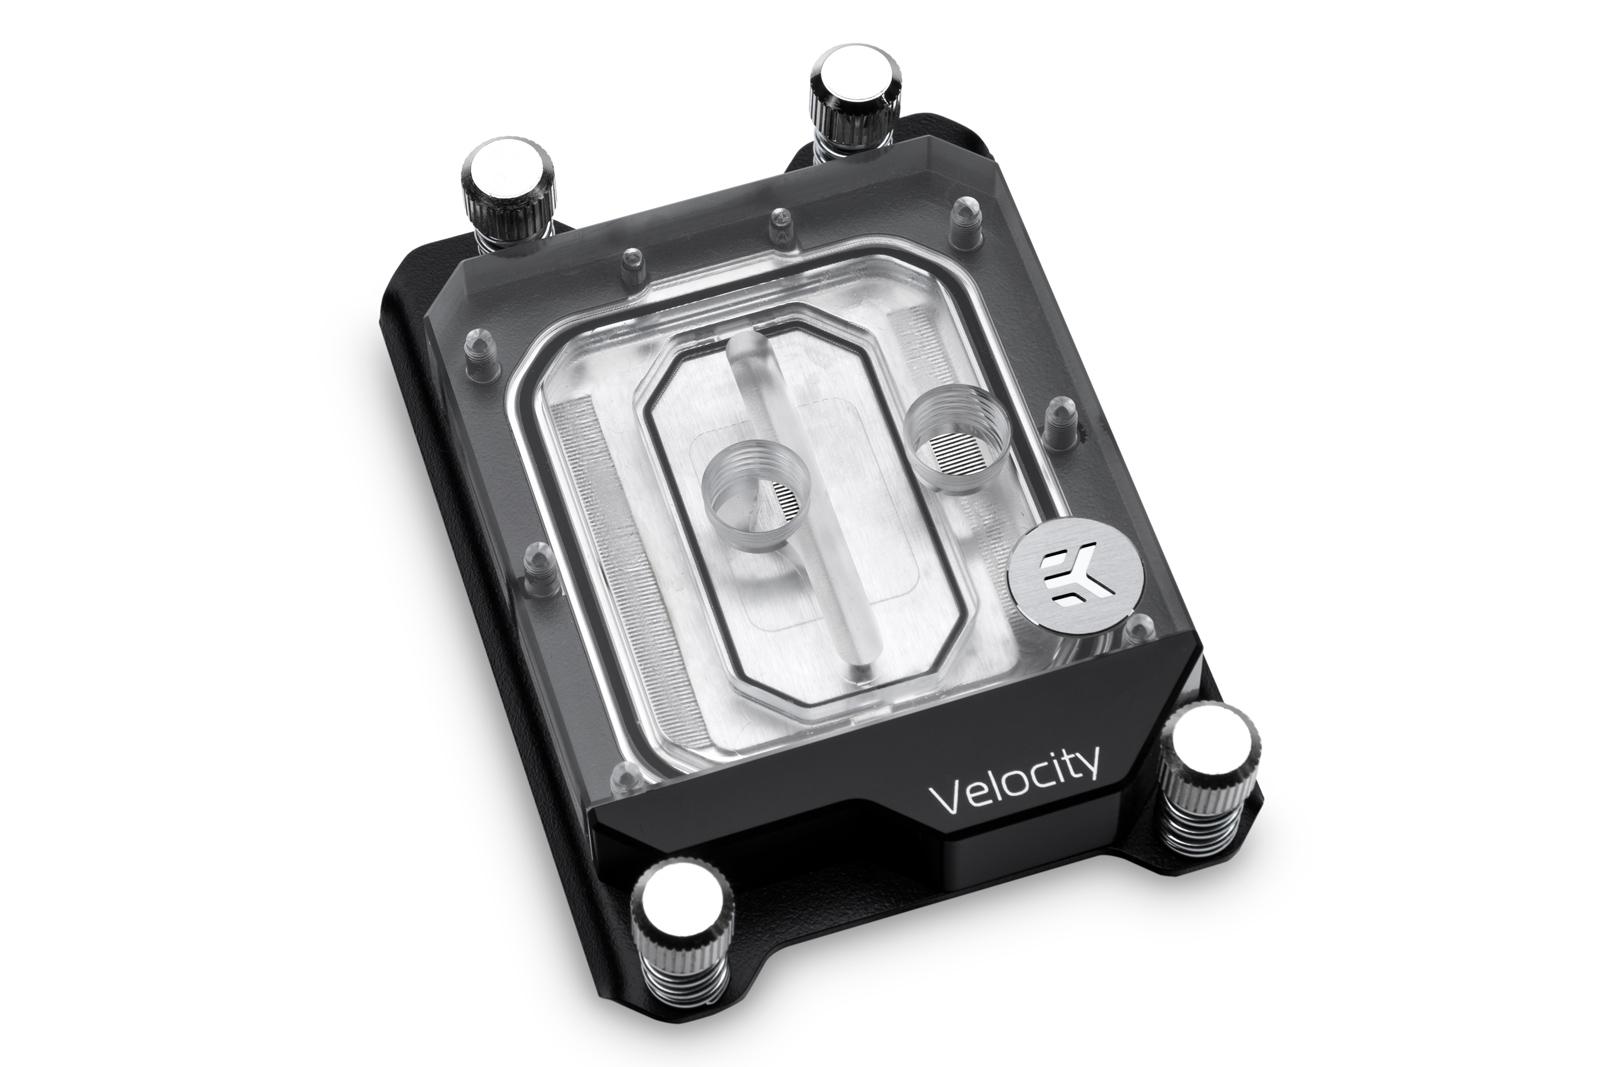 Ek-Velocity sTR4